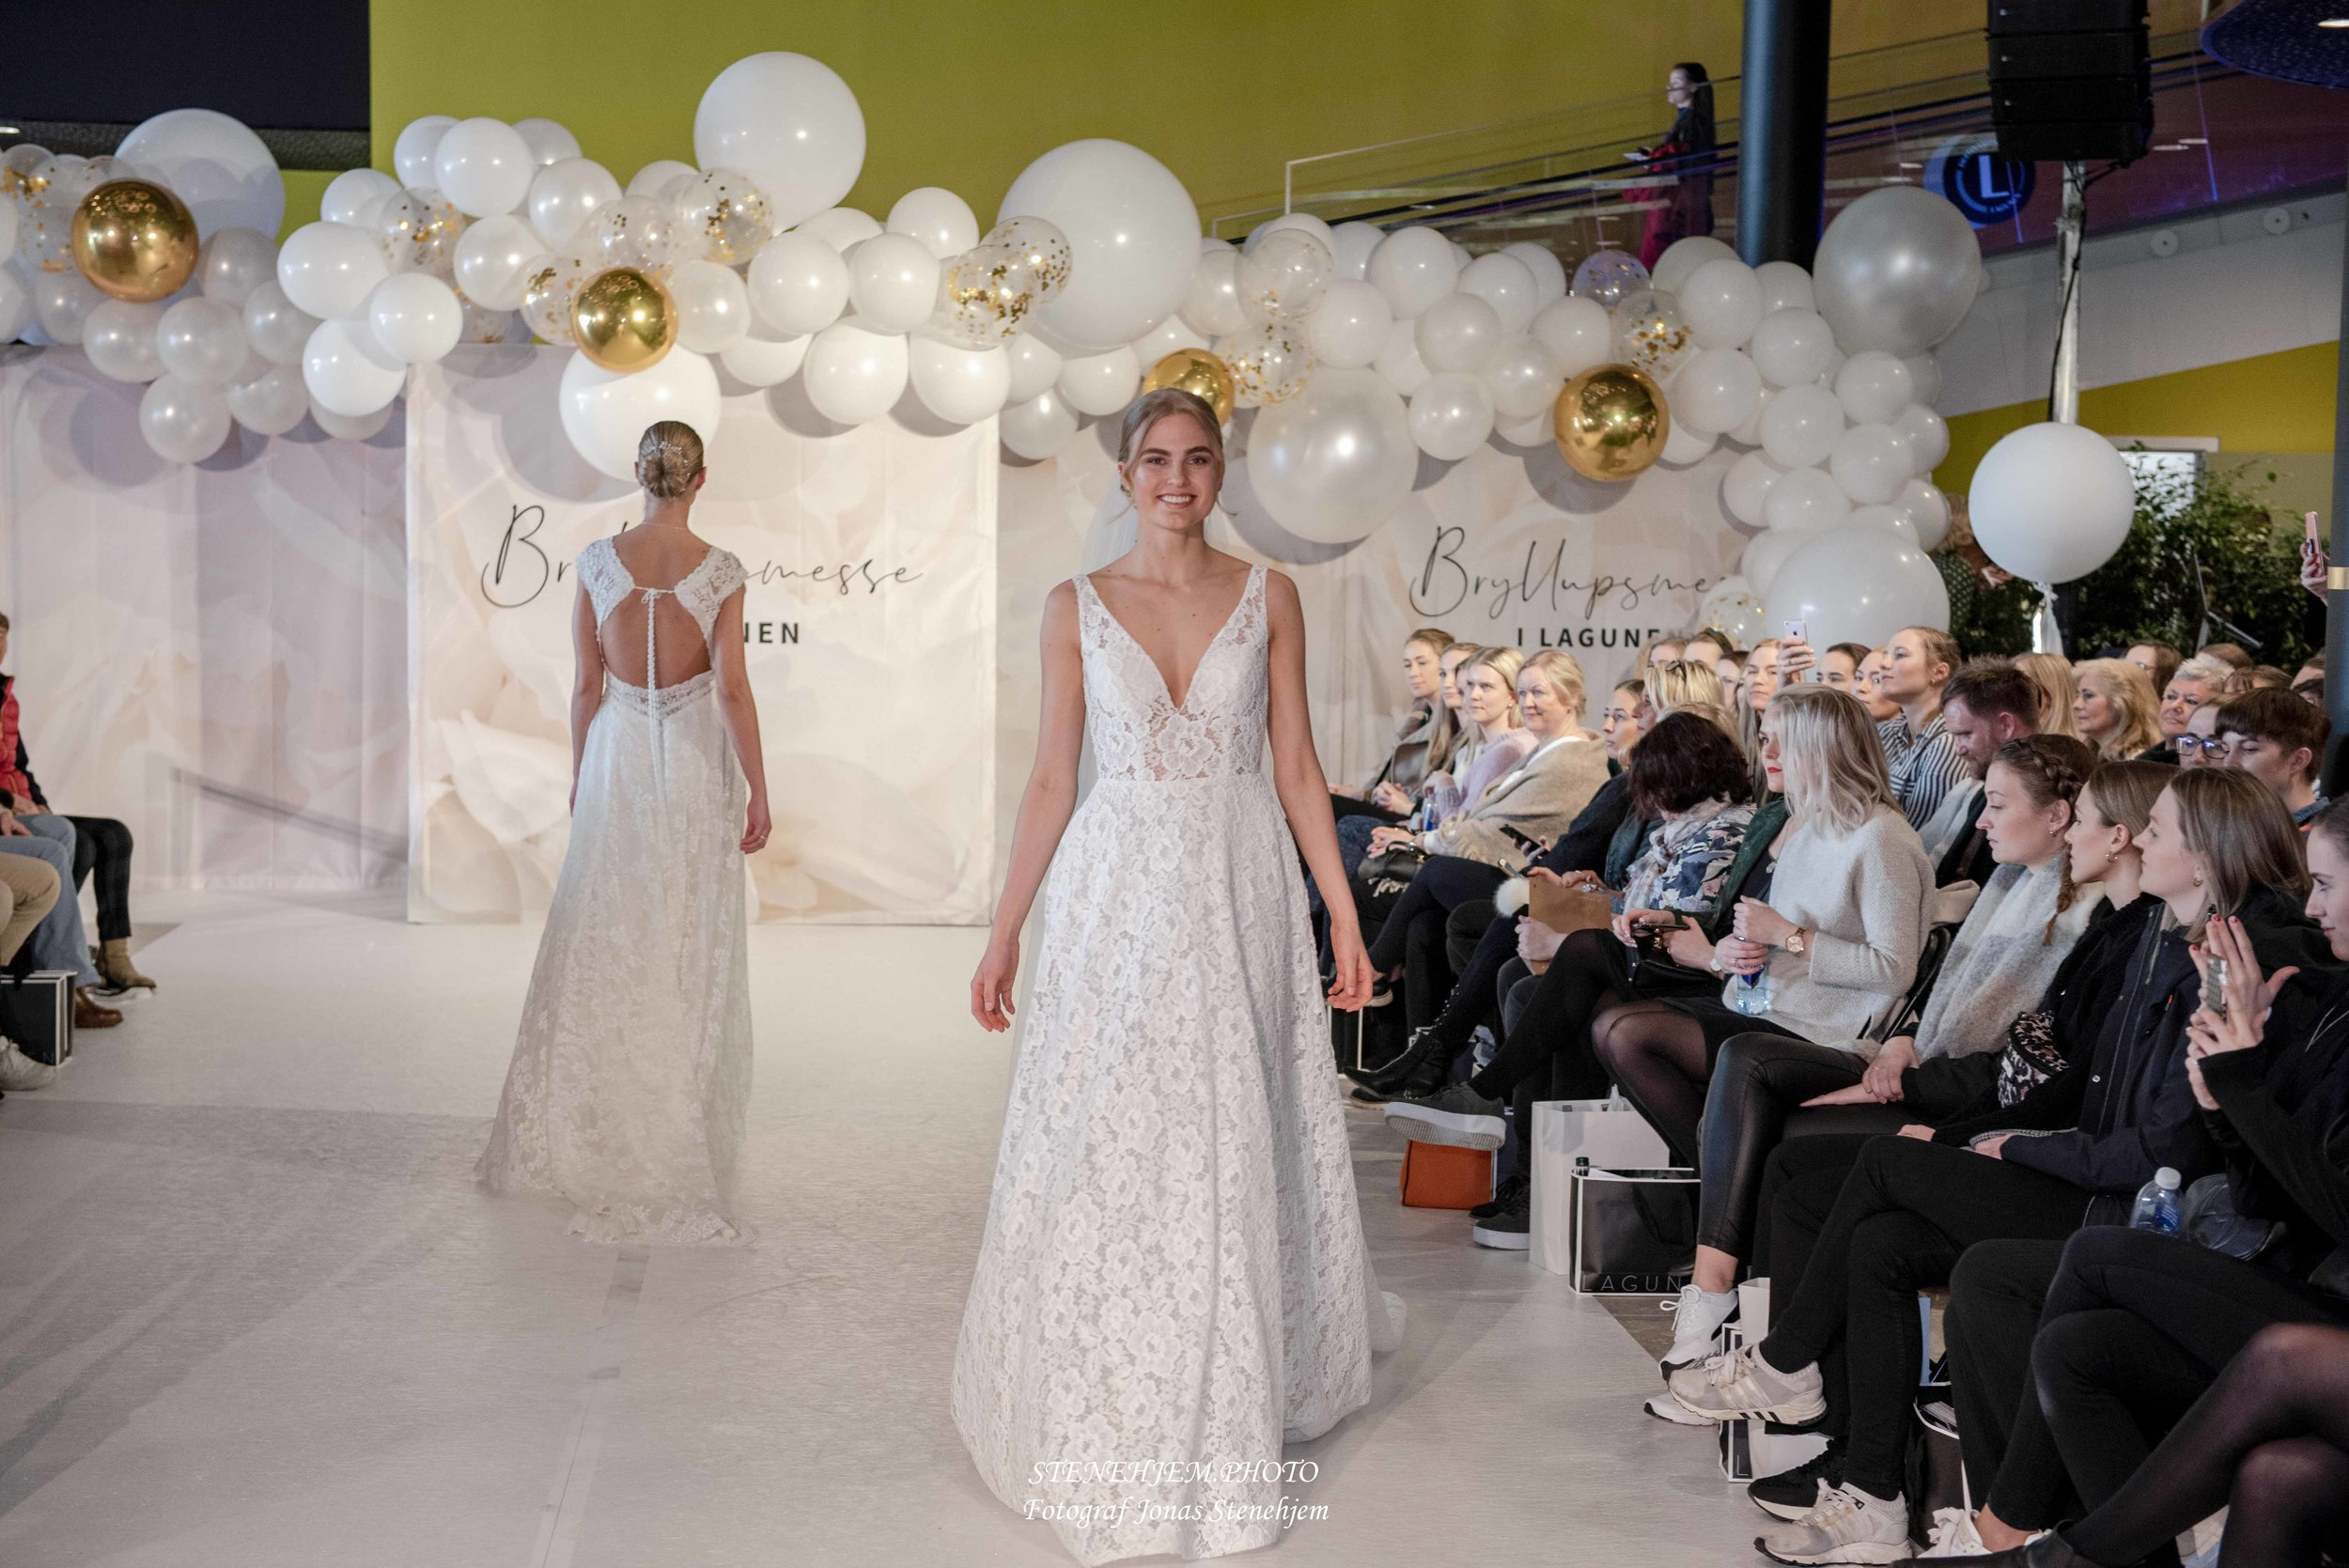 Bryllupsmesse_Lagunen_mittaltweddingfair__071.jpg